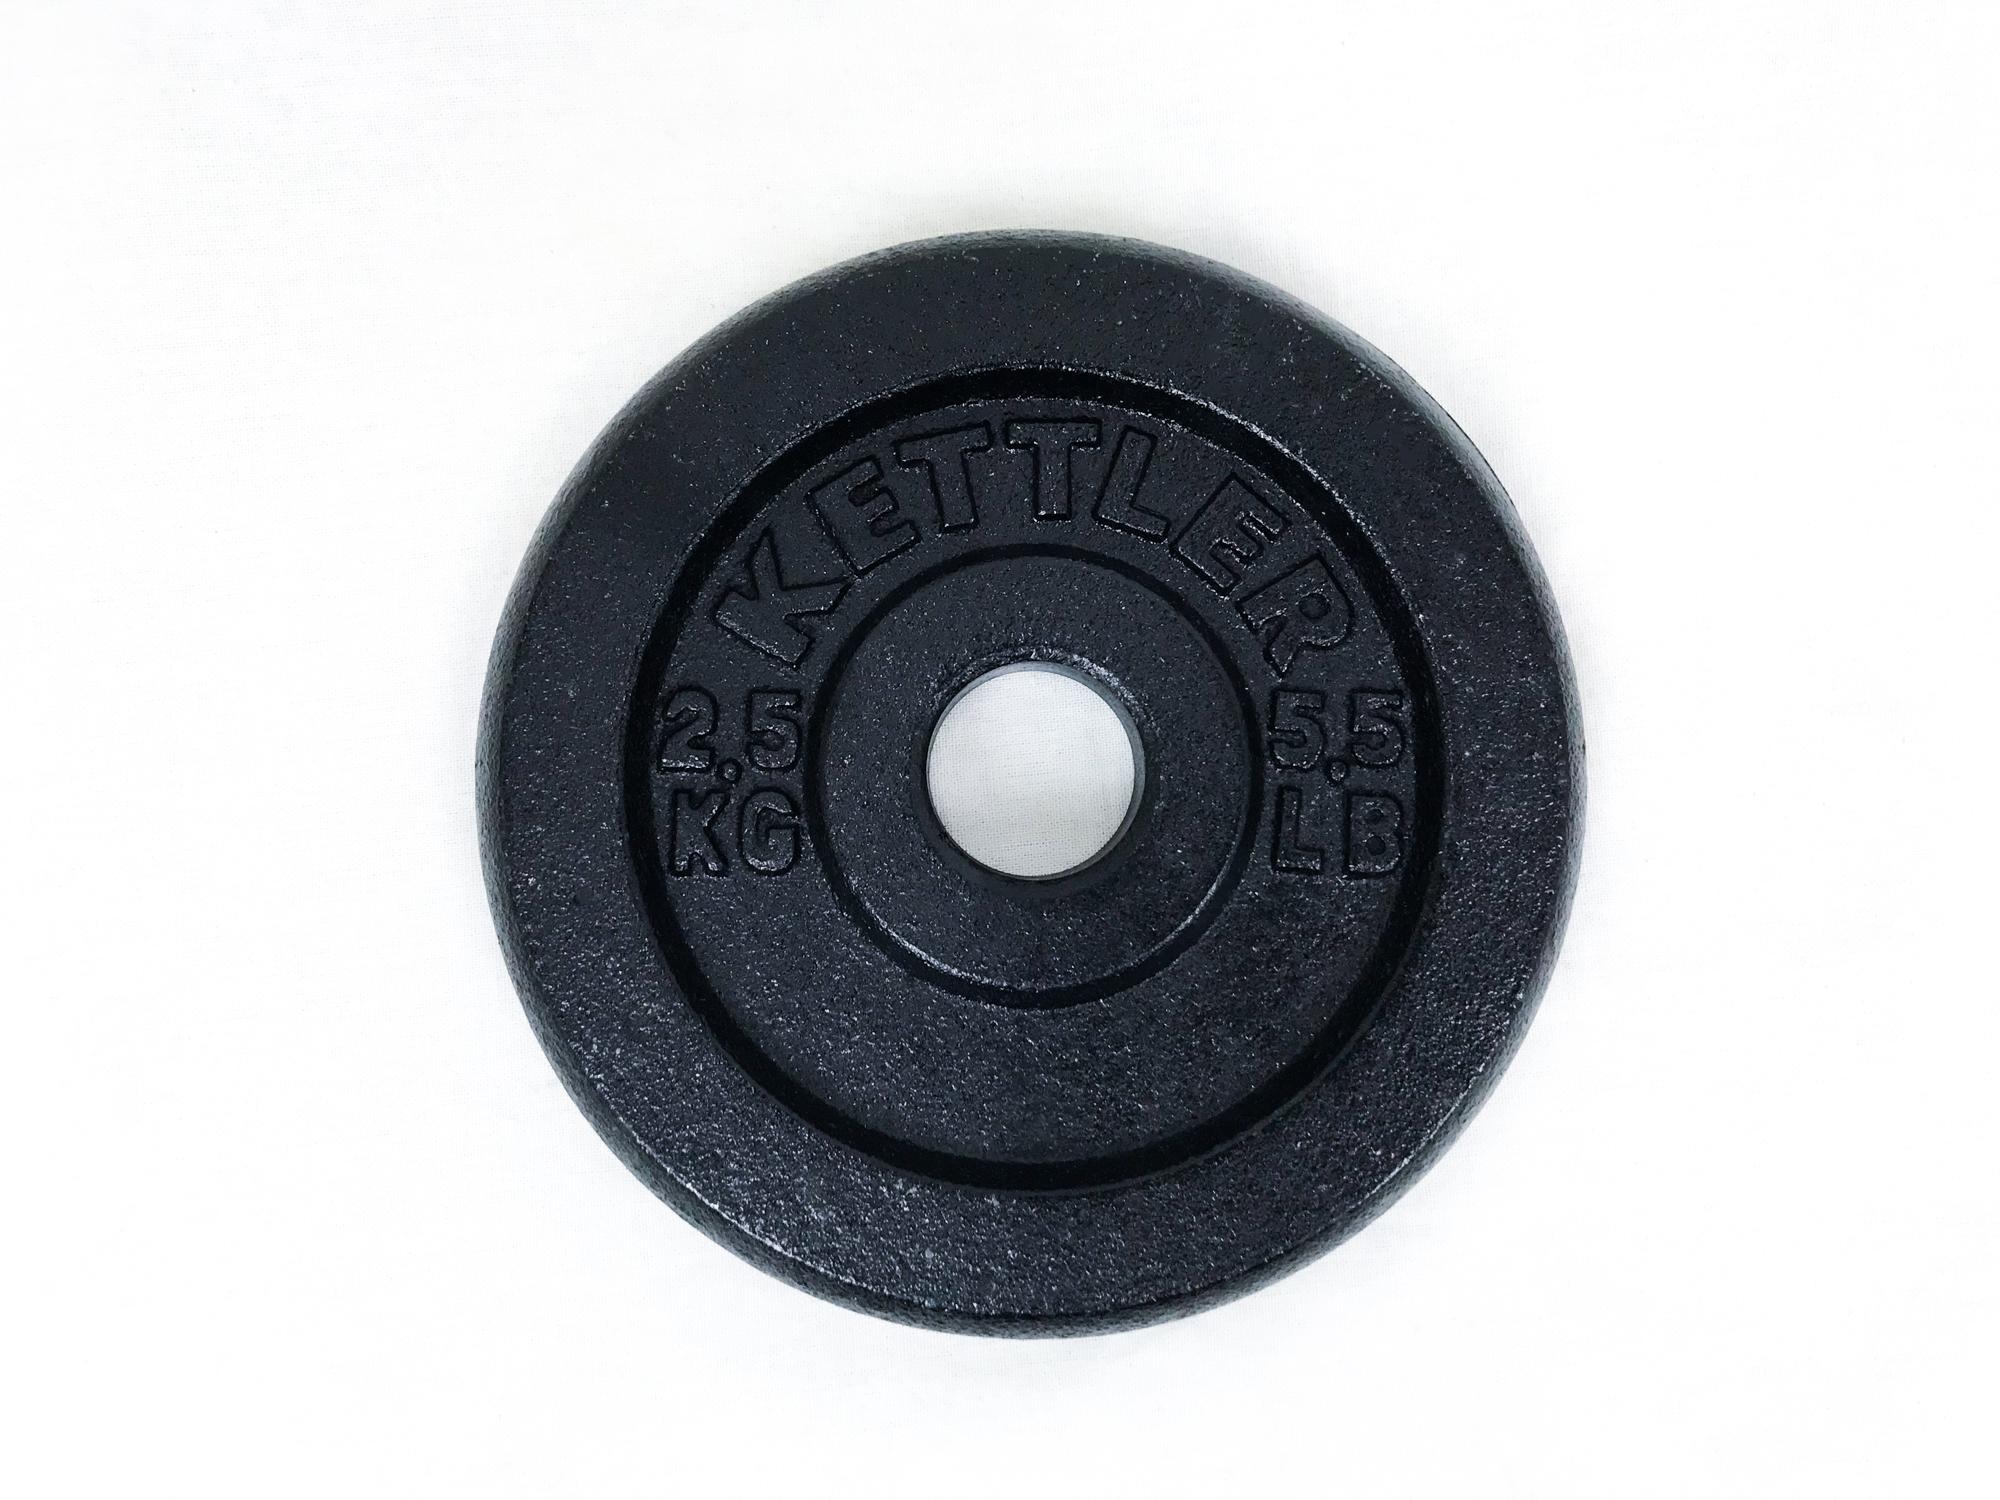 Kettler Kal 803010 Cast Iron Weight Plate (2.5 Kg) By Vito Art Of Fitness (capitaland Merchant).